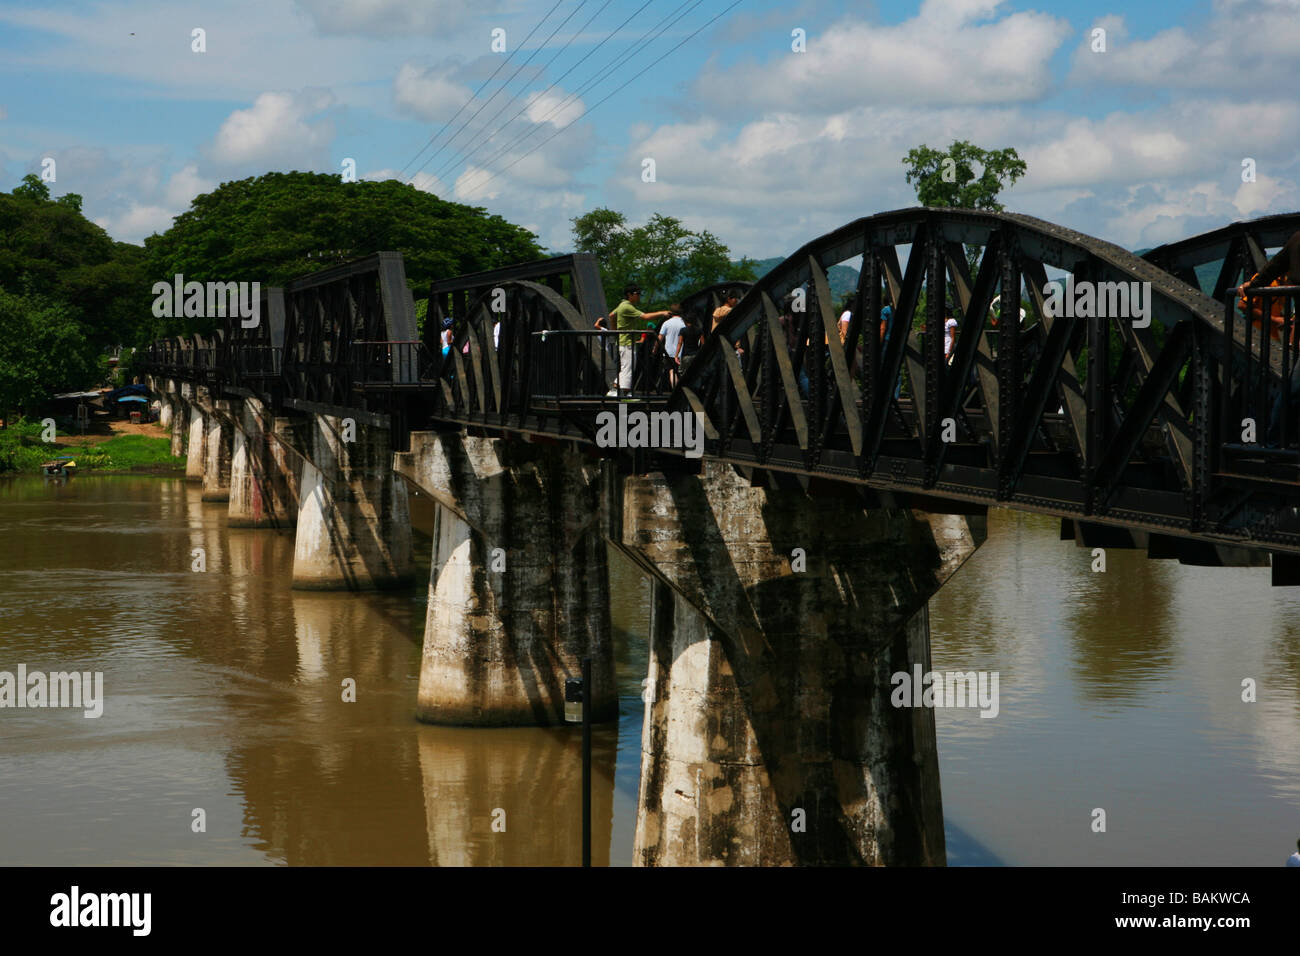 Bridge over the River Kwai, Kanchanaburi, Bangkok, Thailand - Stock Image